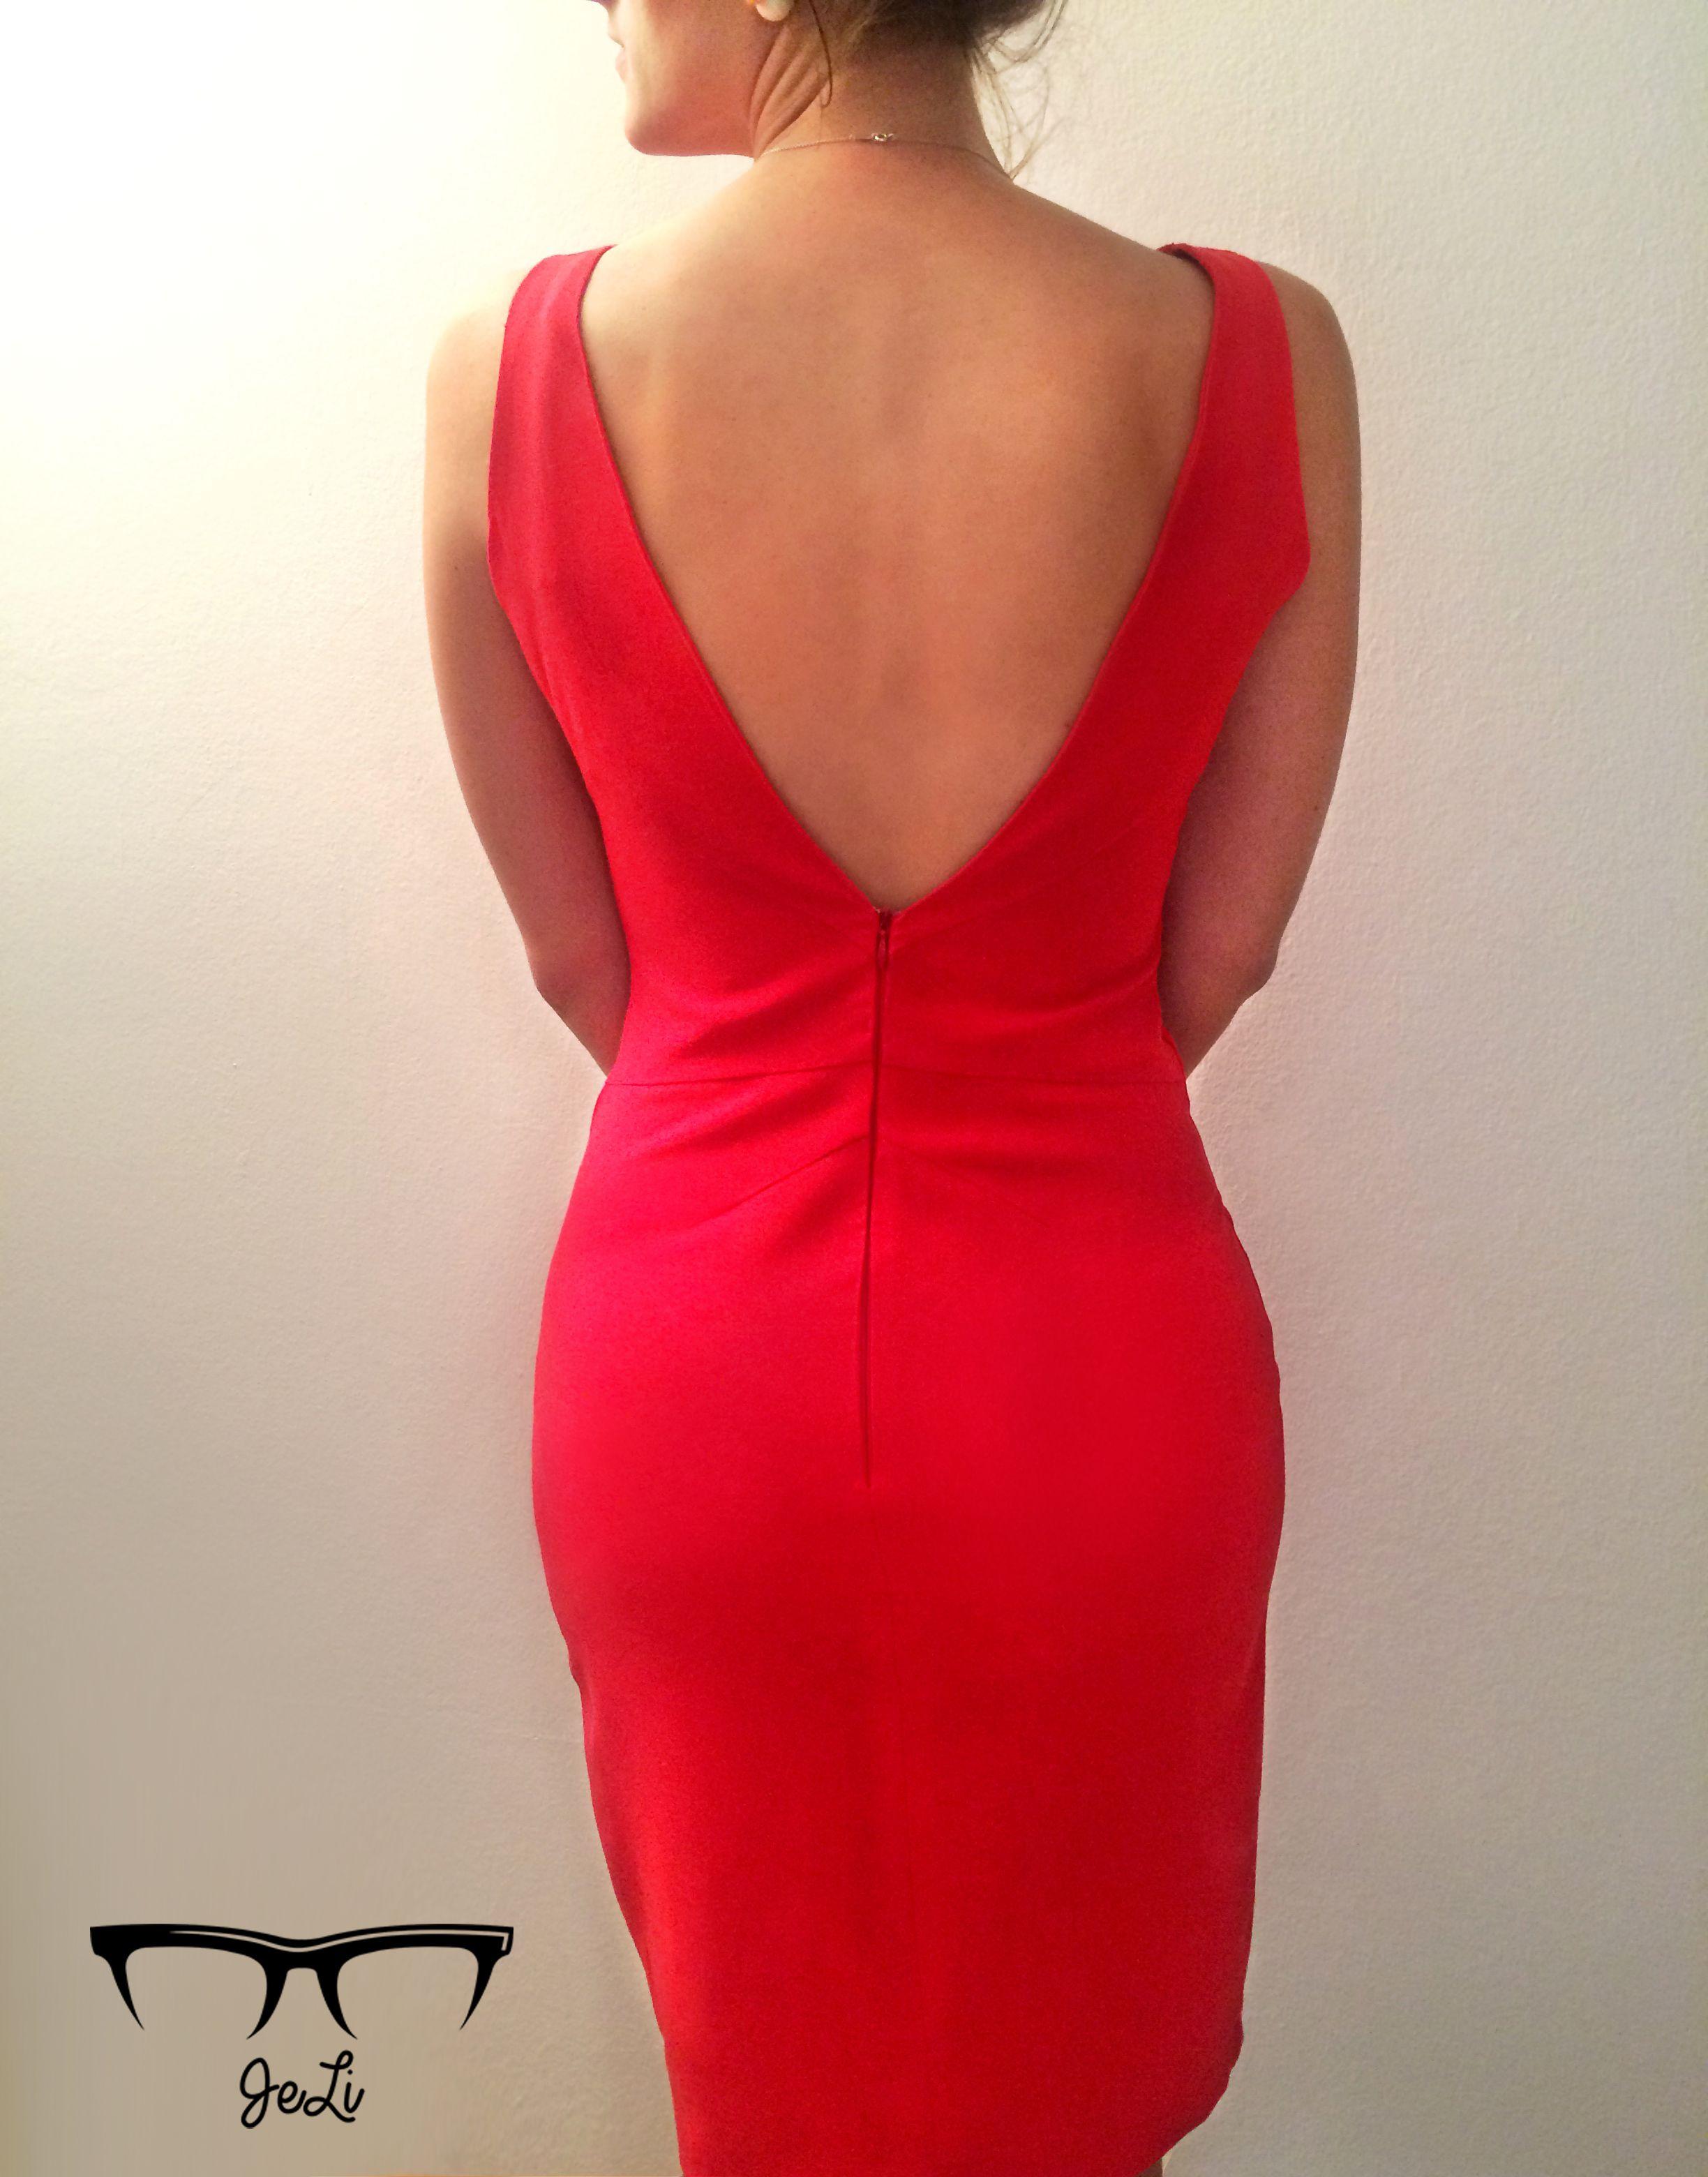 Rotes Kleid Rückenfrei nach Burda Schnittmuster | Schnittmuster ...